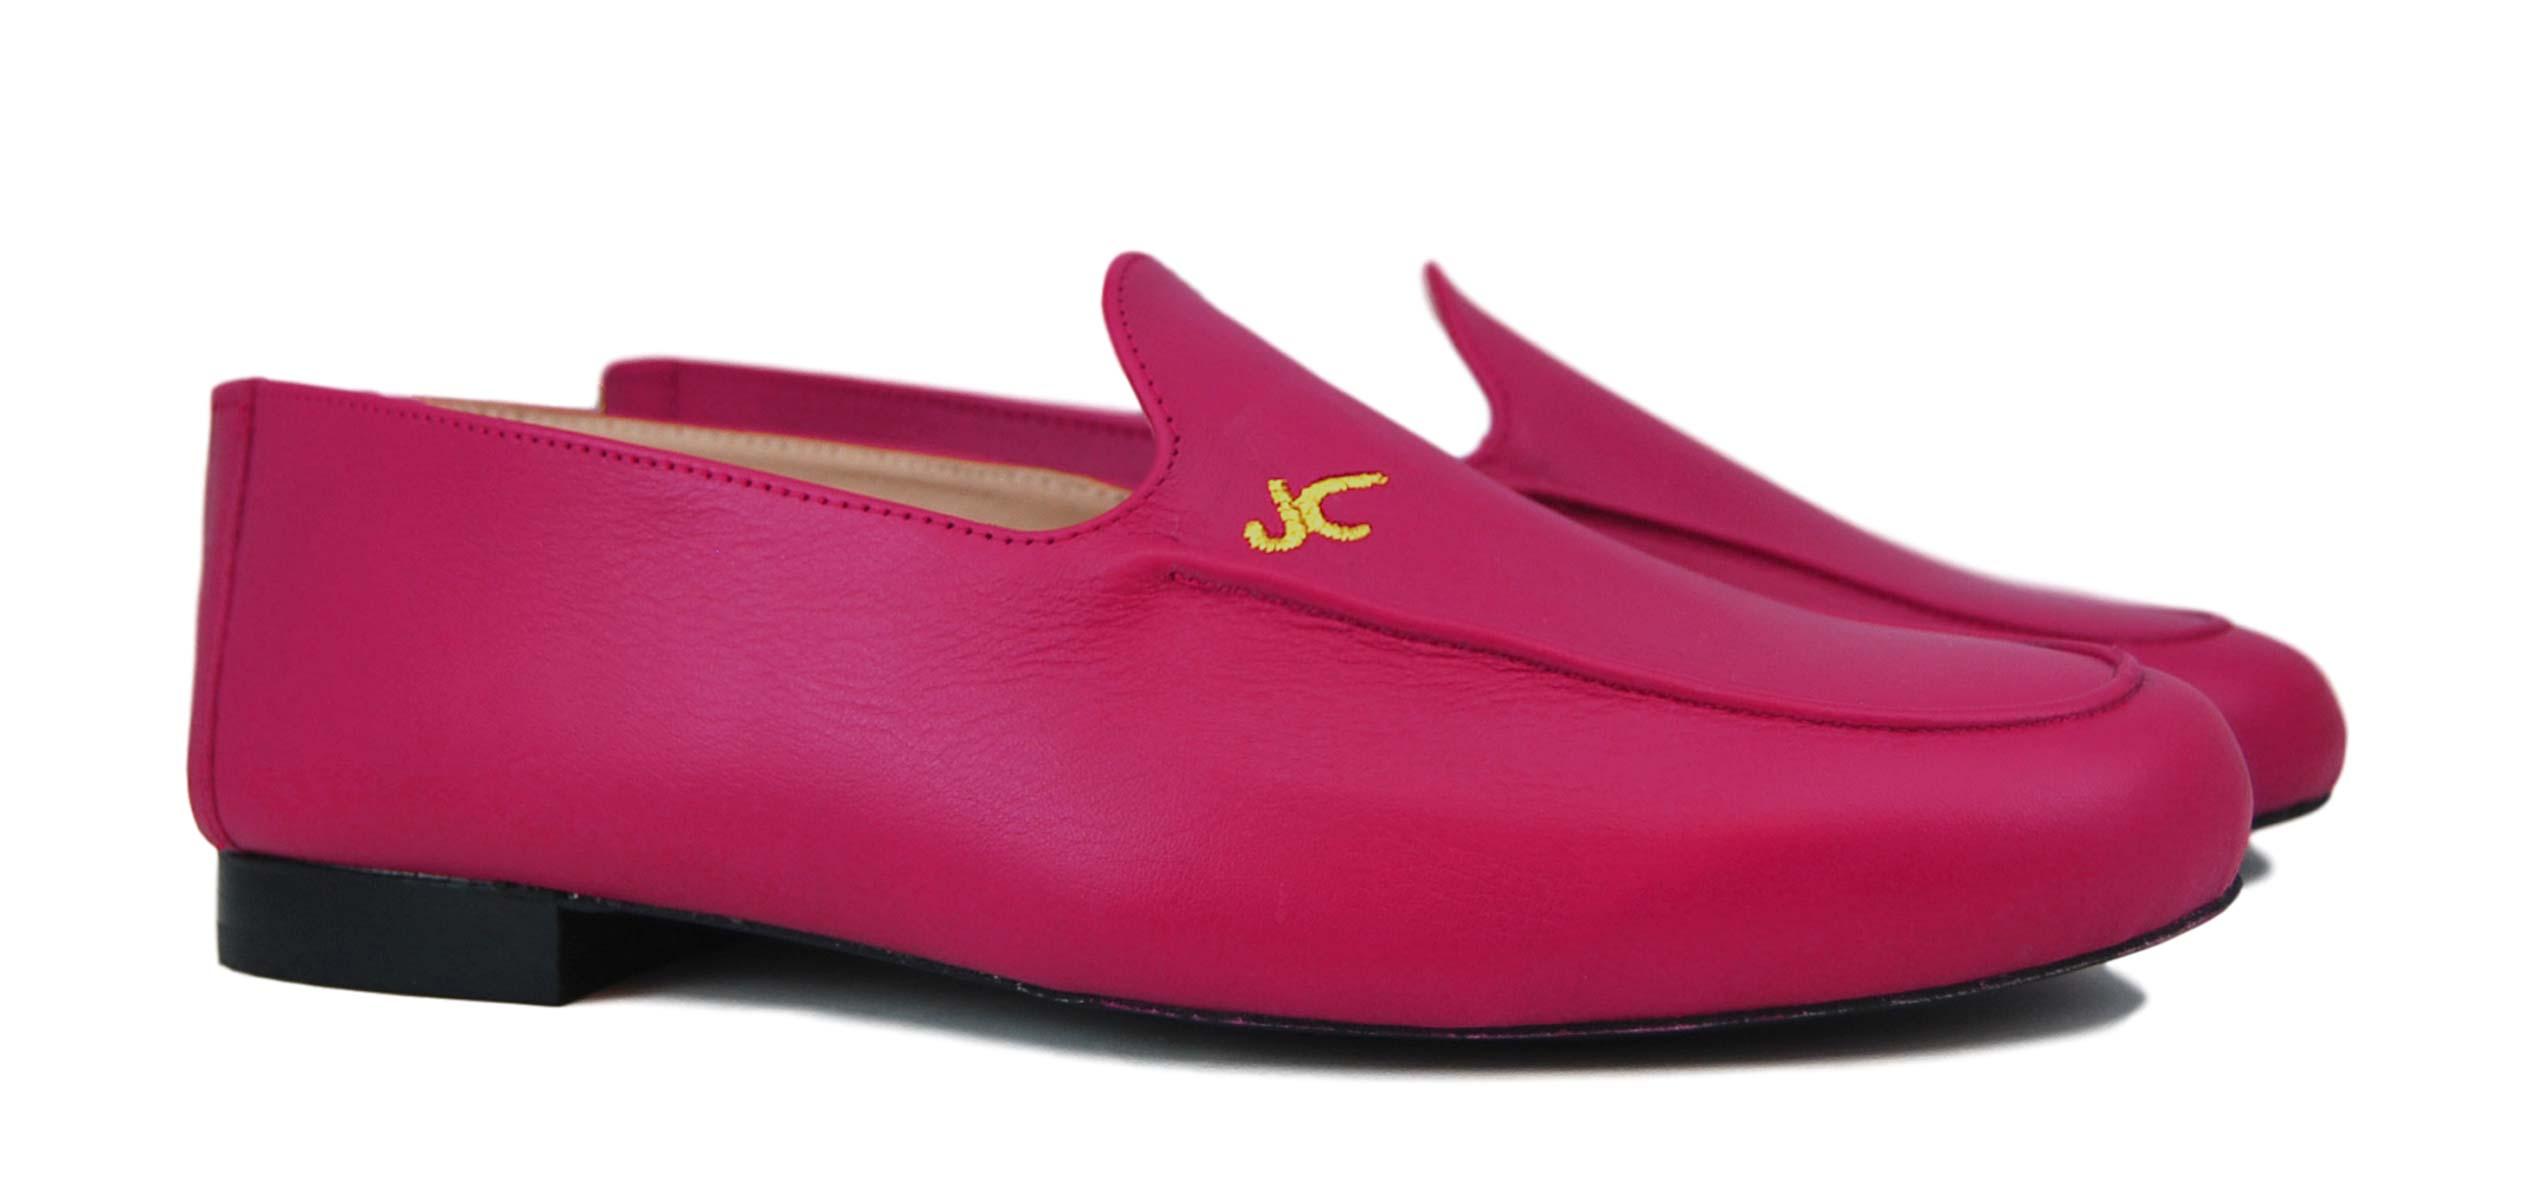 Foto 5 de Zapatos Julio Iglesias 528 JC Magenta Napa